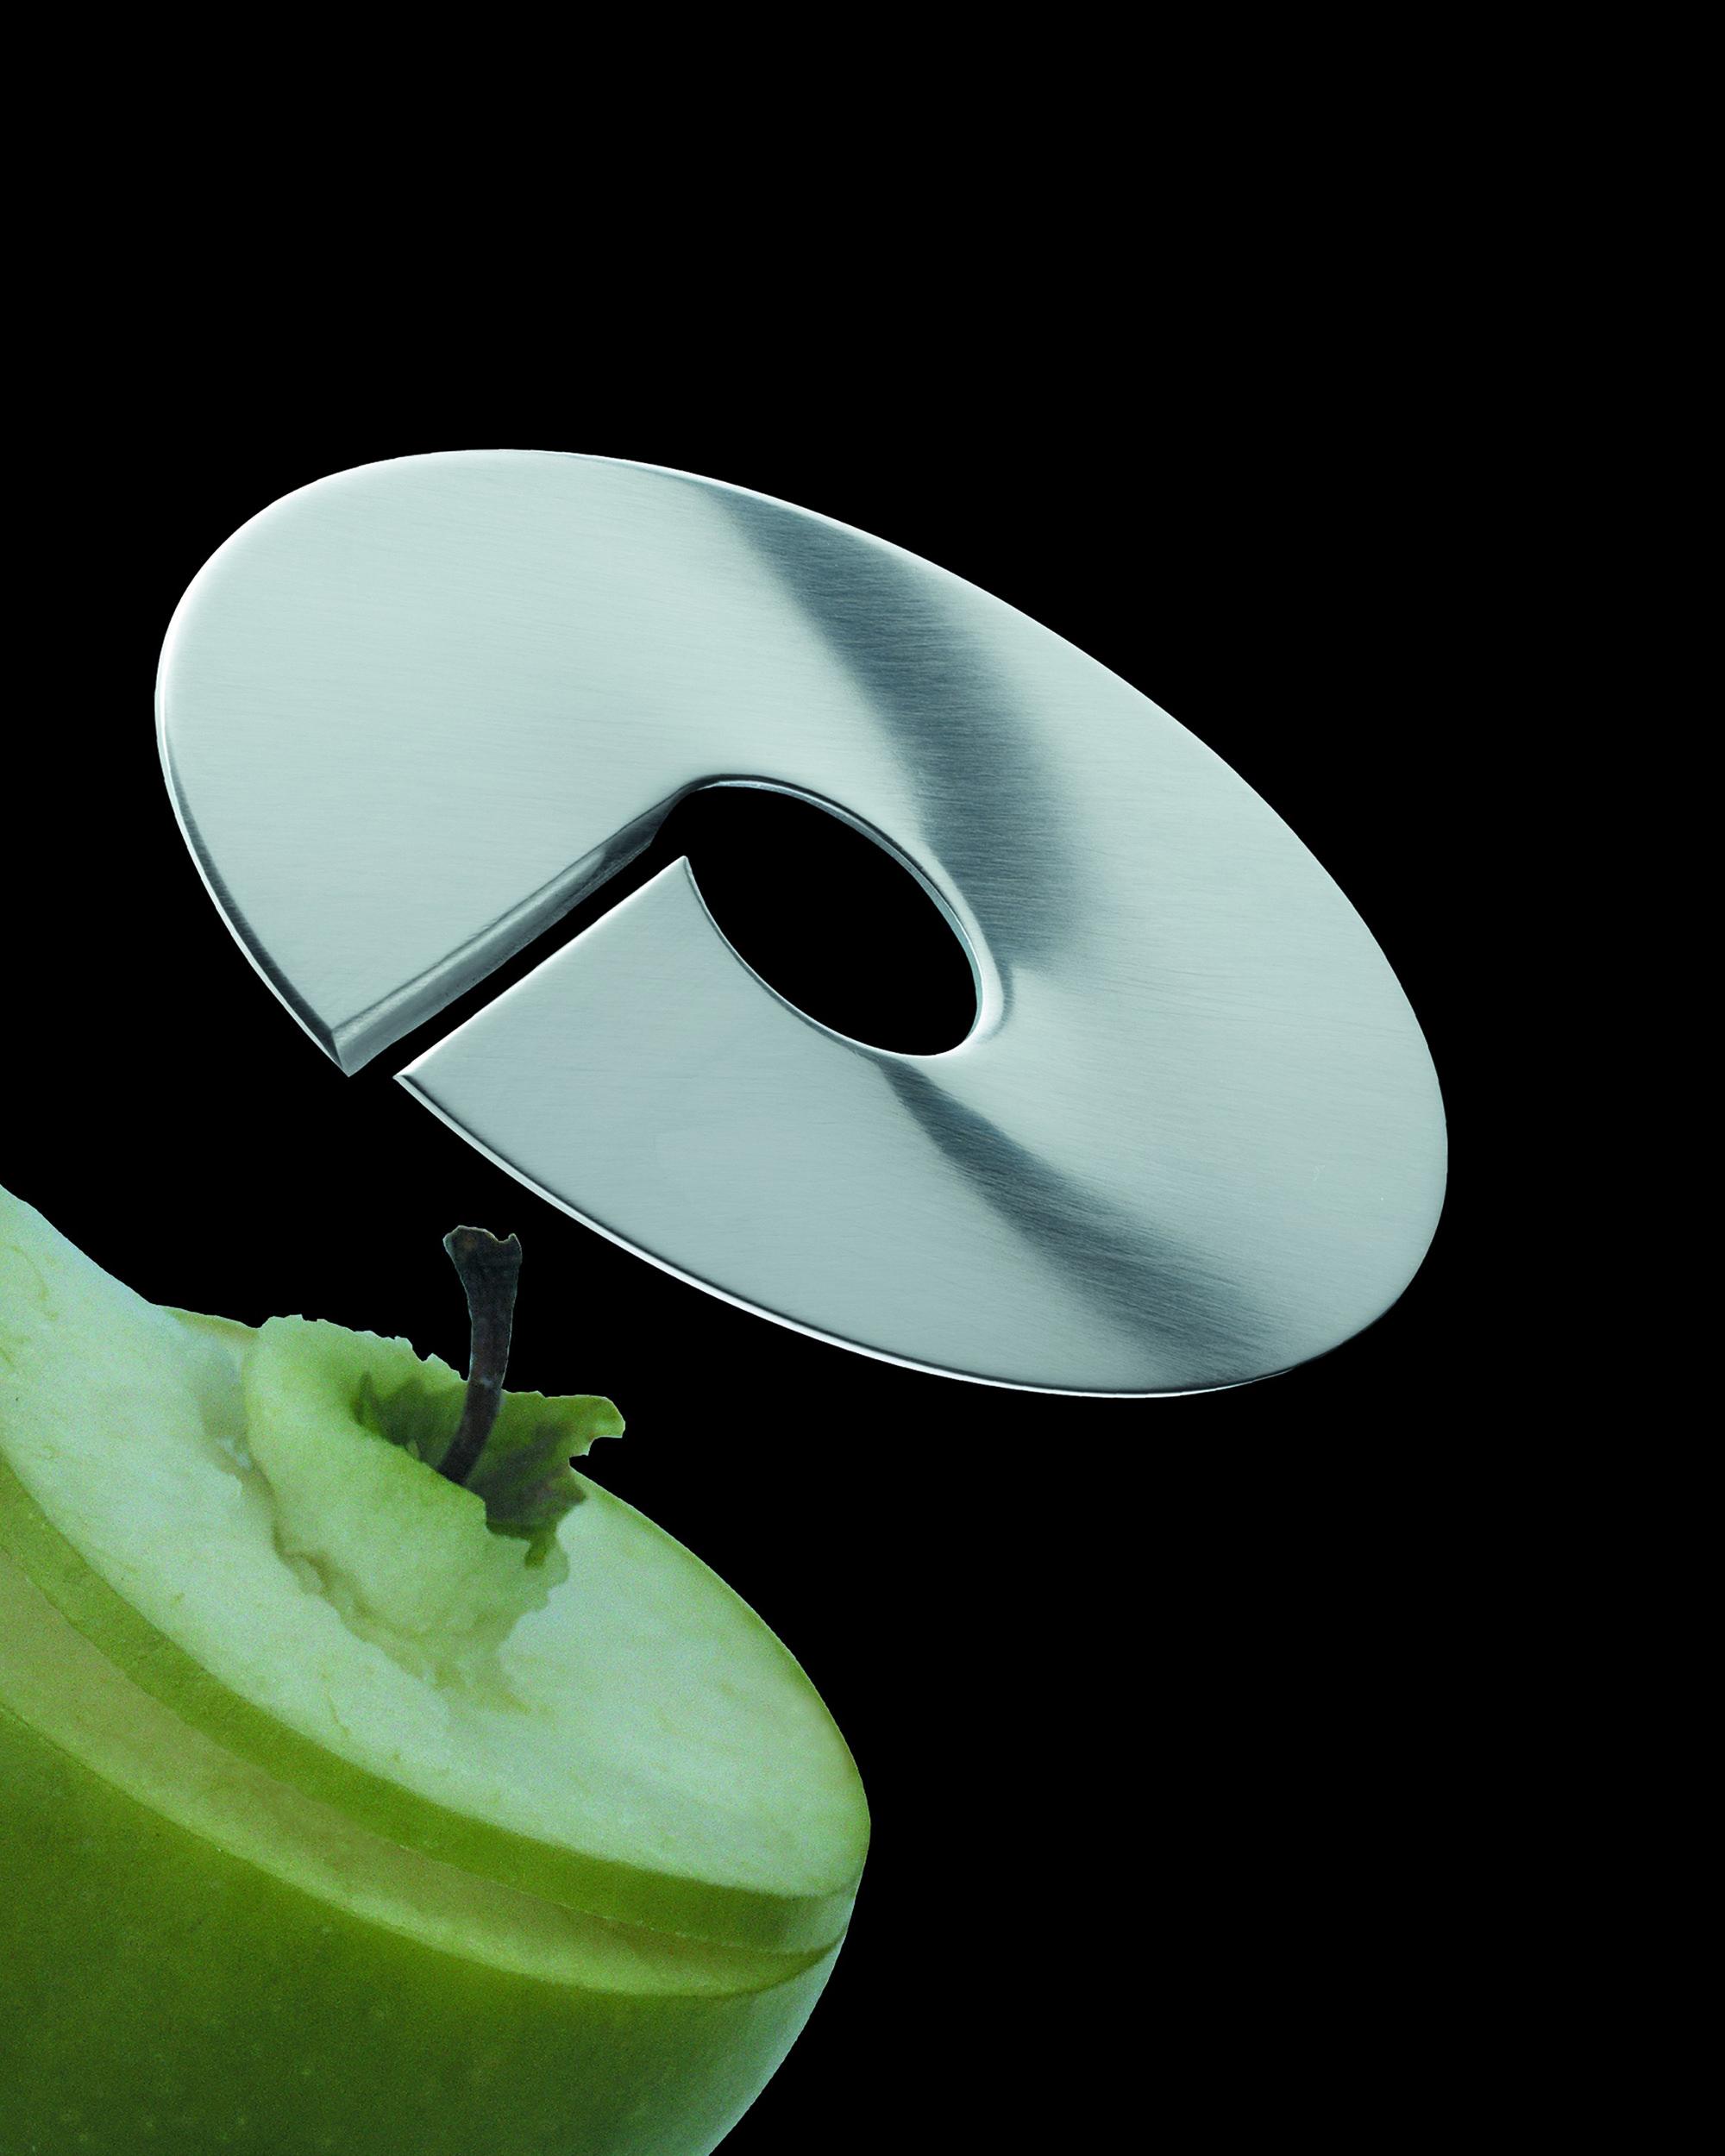 Mono Giro Apfelschneider Apple slicer 01